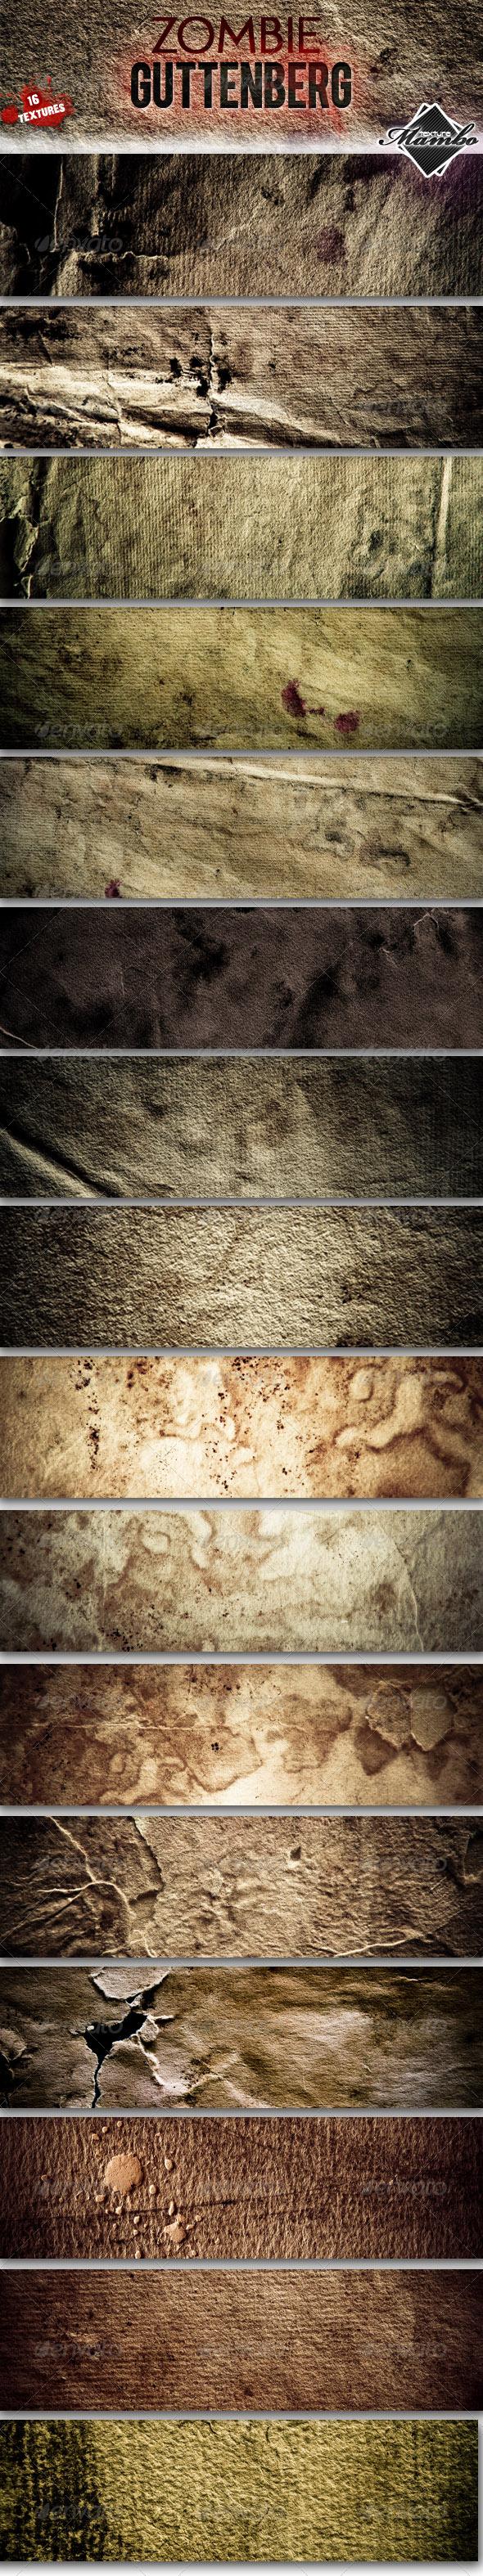 GraphicRiver Zombie Guttenberg Paper textures 162403